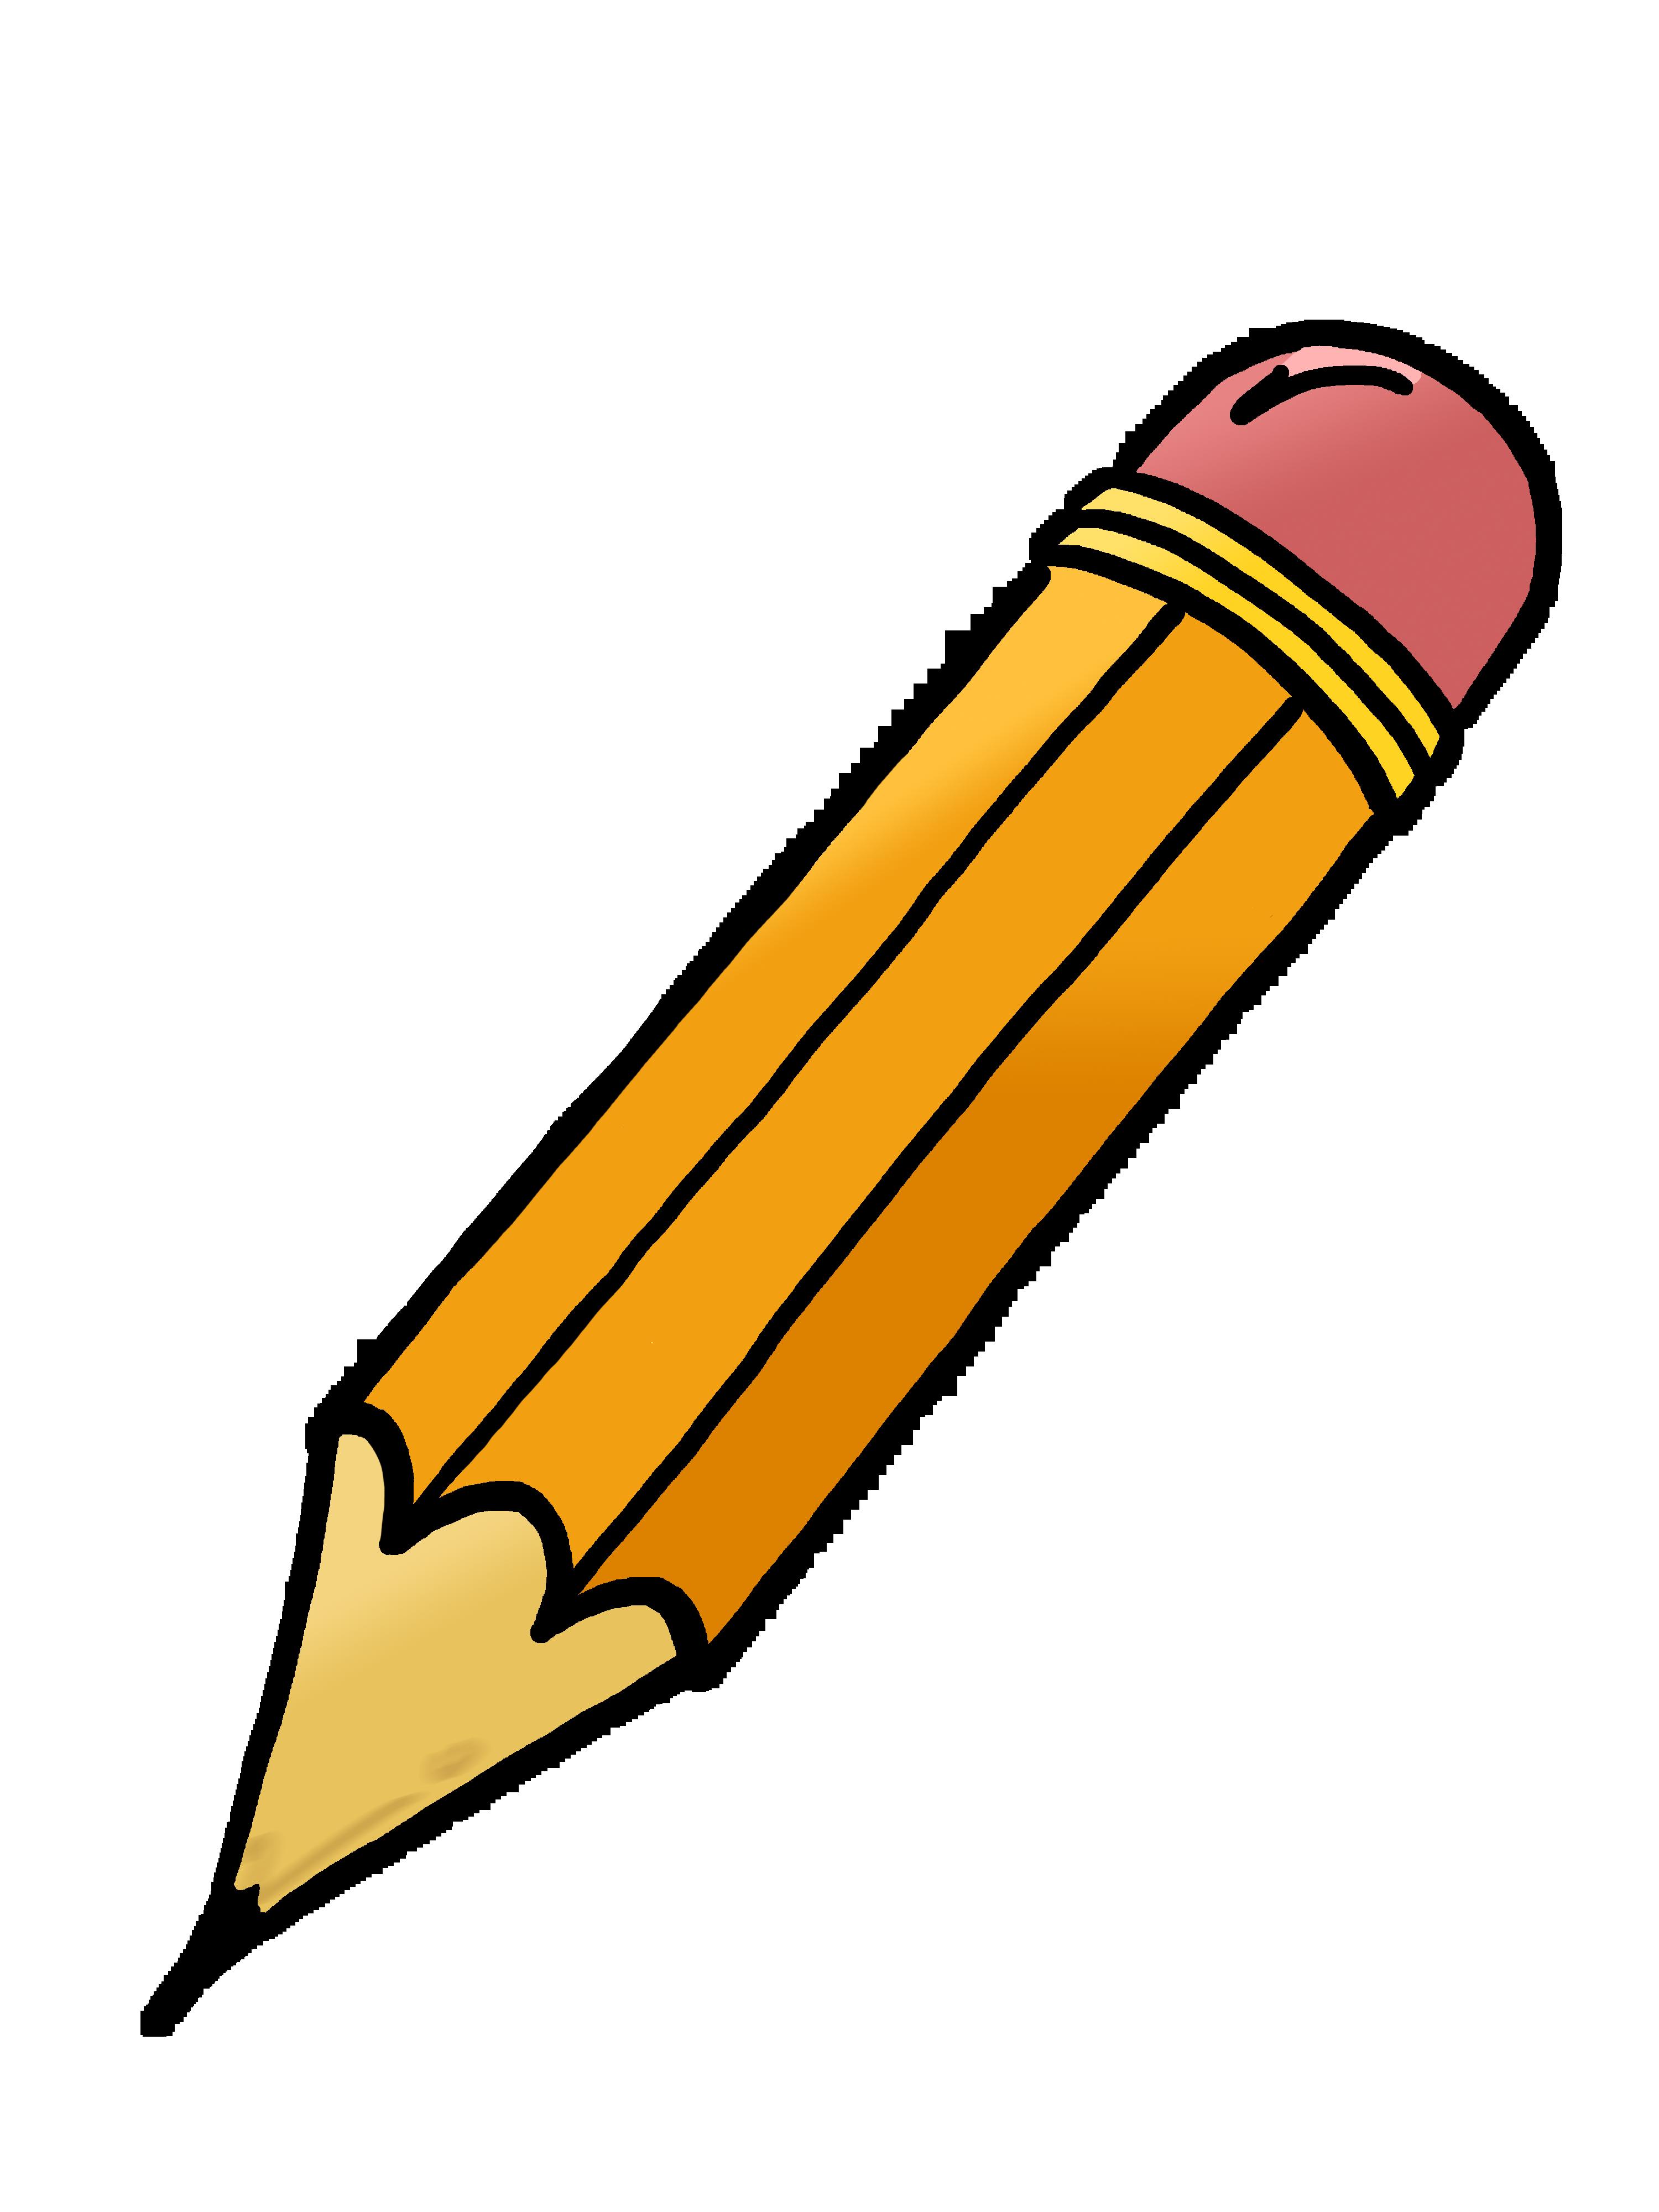 Free Cartoon Pencil Clipart, Download Free Clip Art, Free.